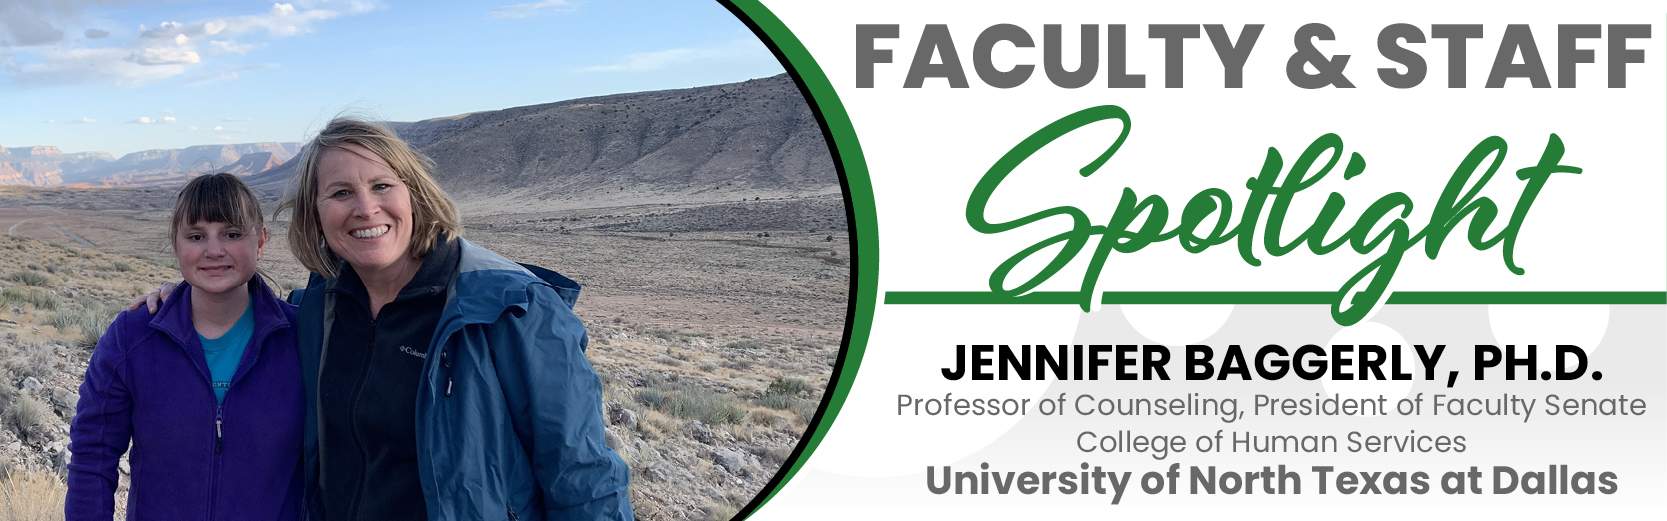 Faculty & Staff Spotlight: Jennifer Baggerly, Ph.D., UNT Dallas